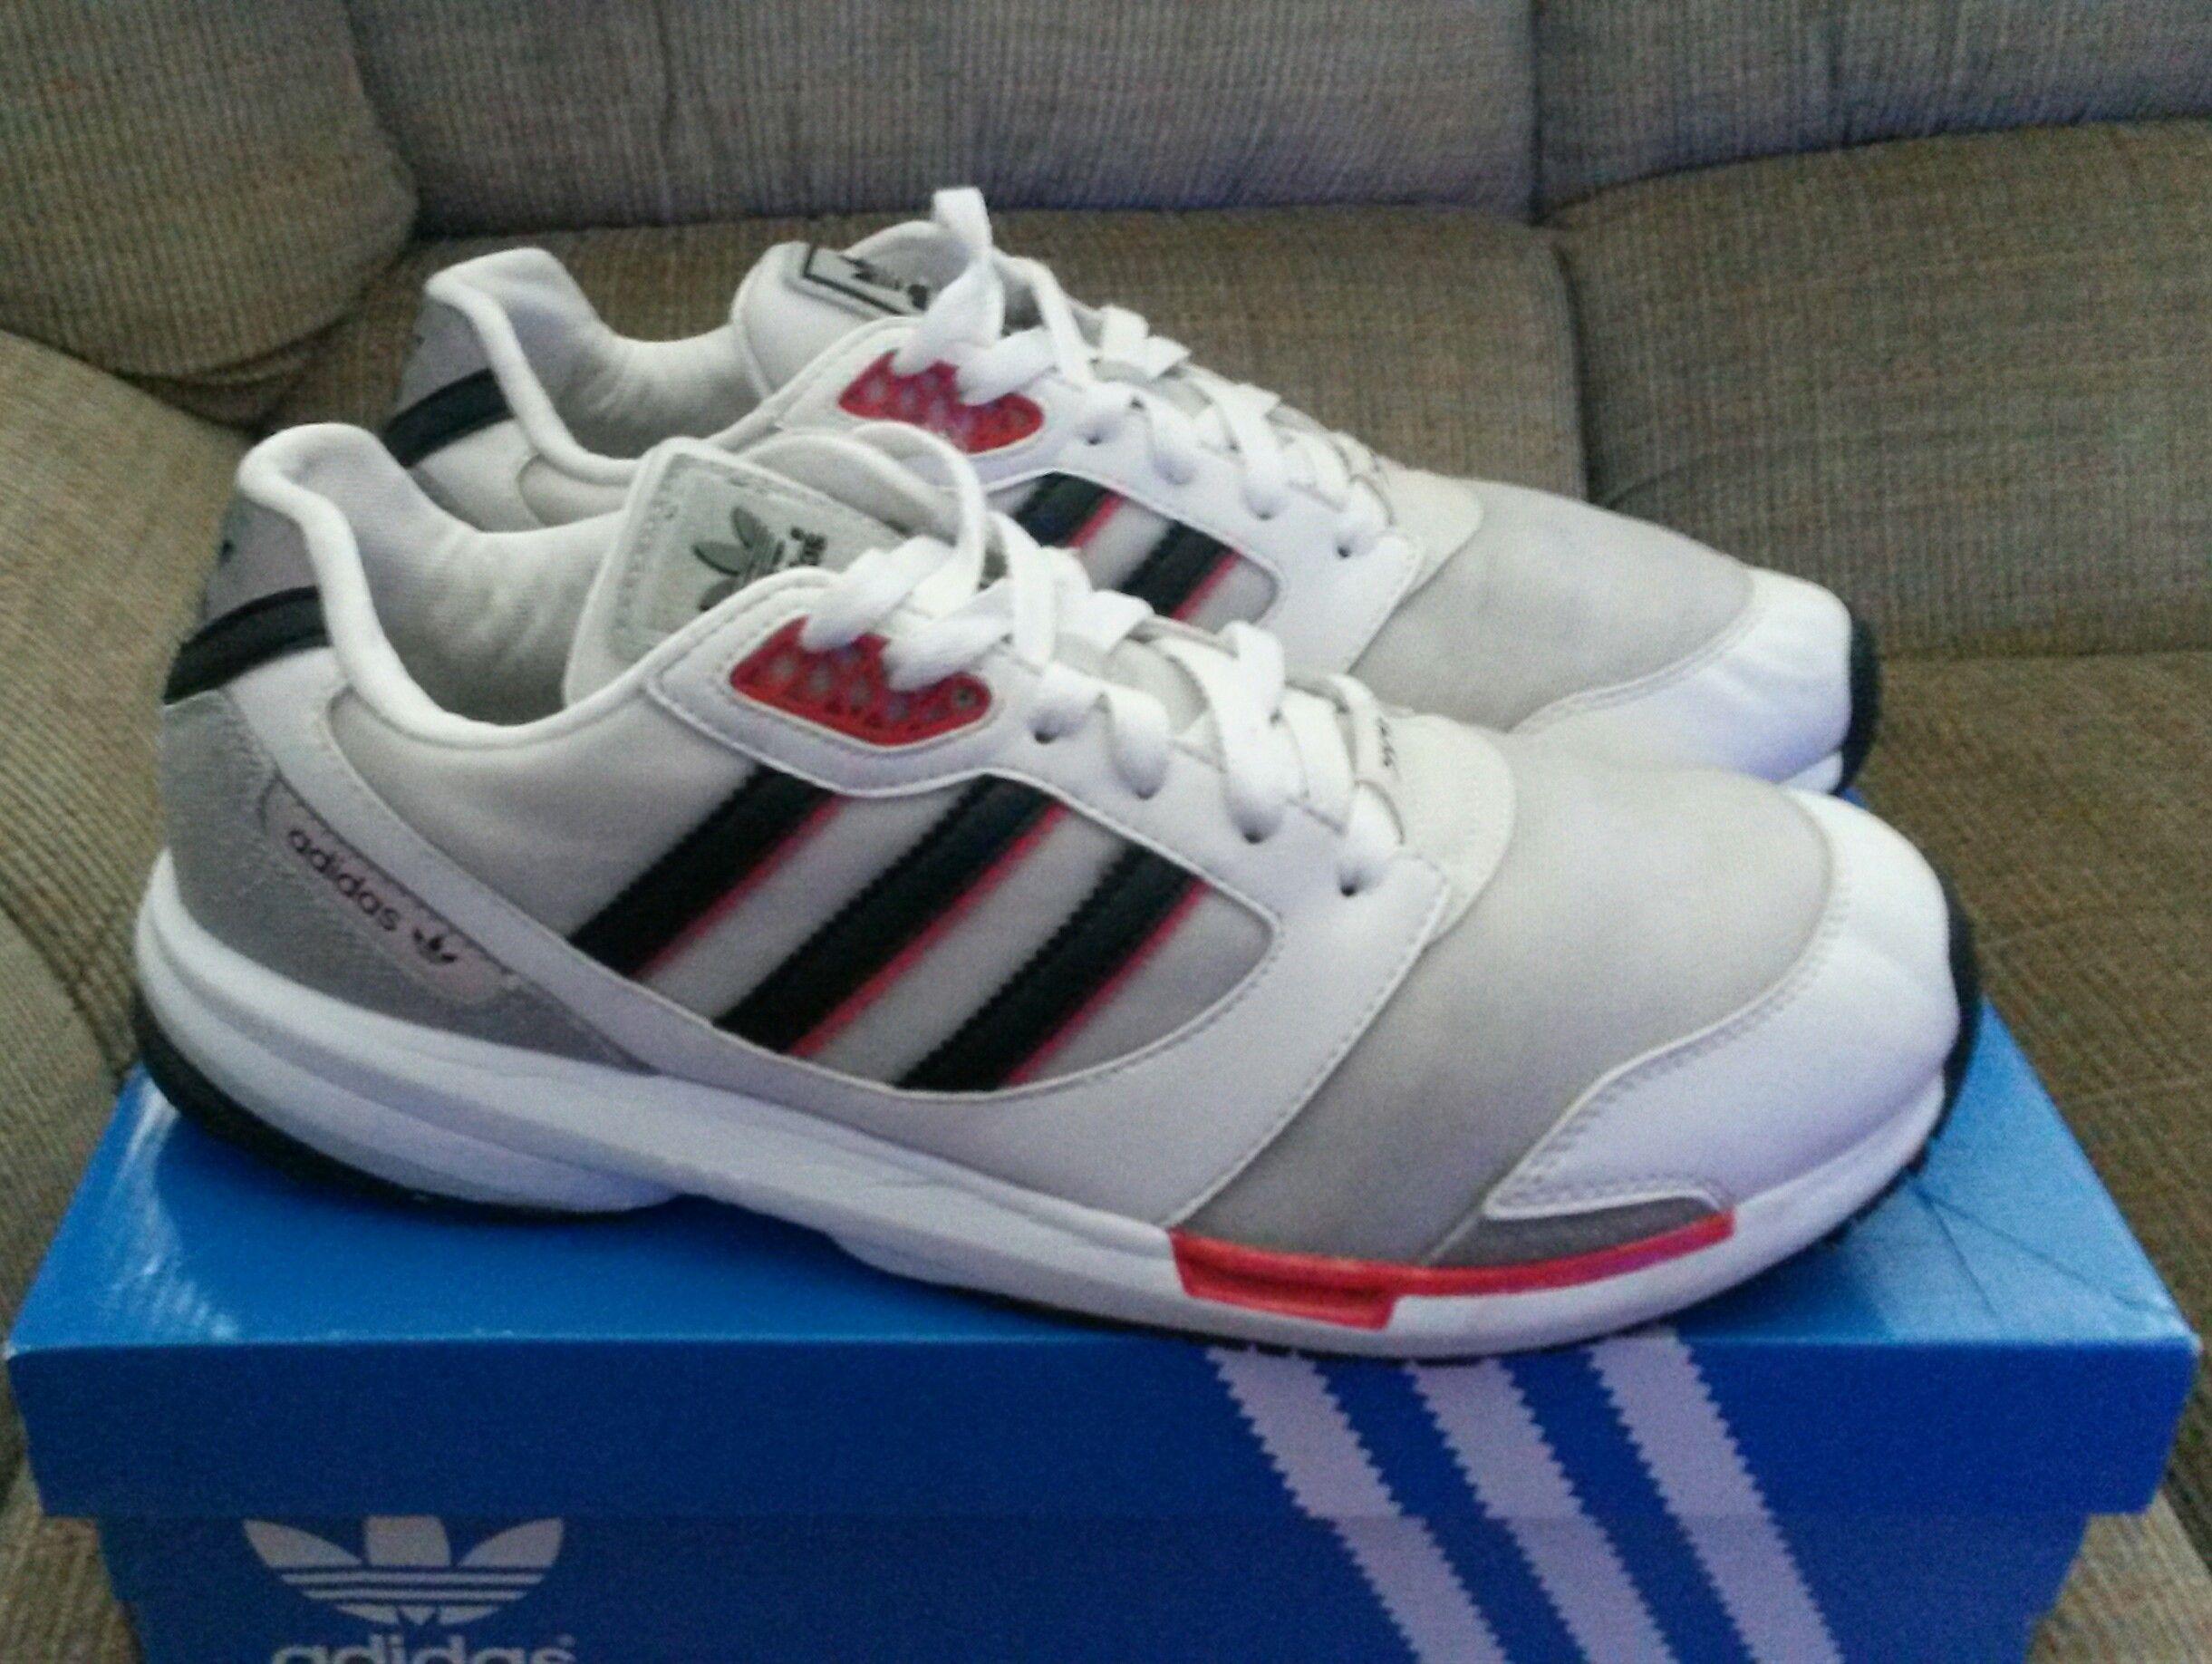 Adidas superstar sneaker, Adidas zx, Adidas